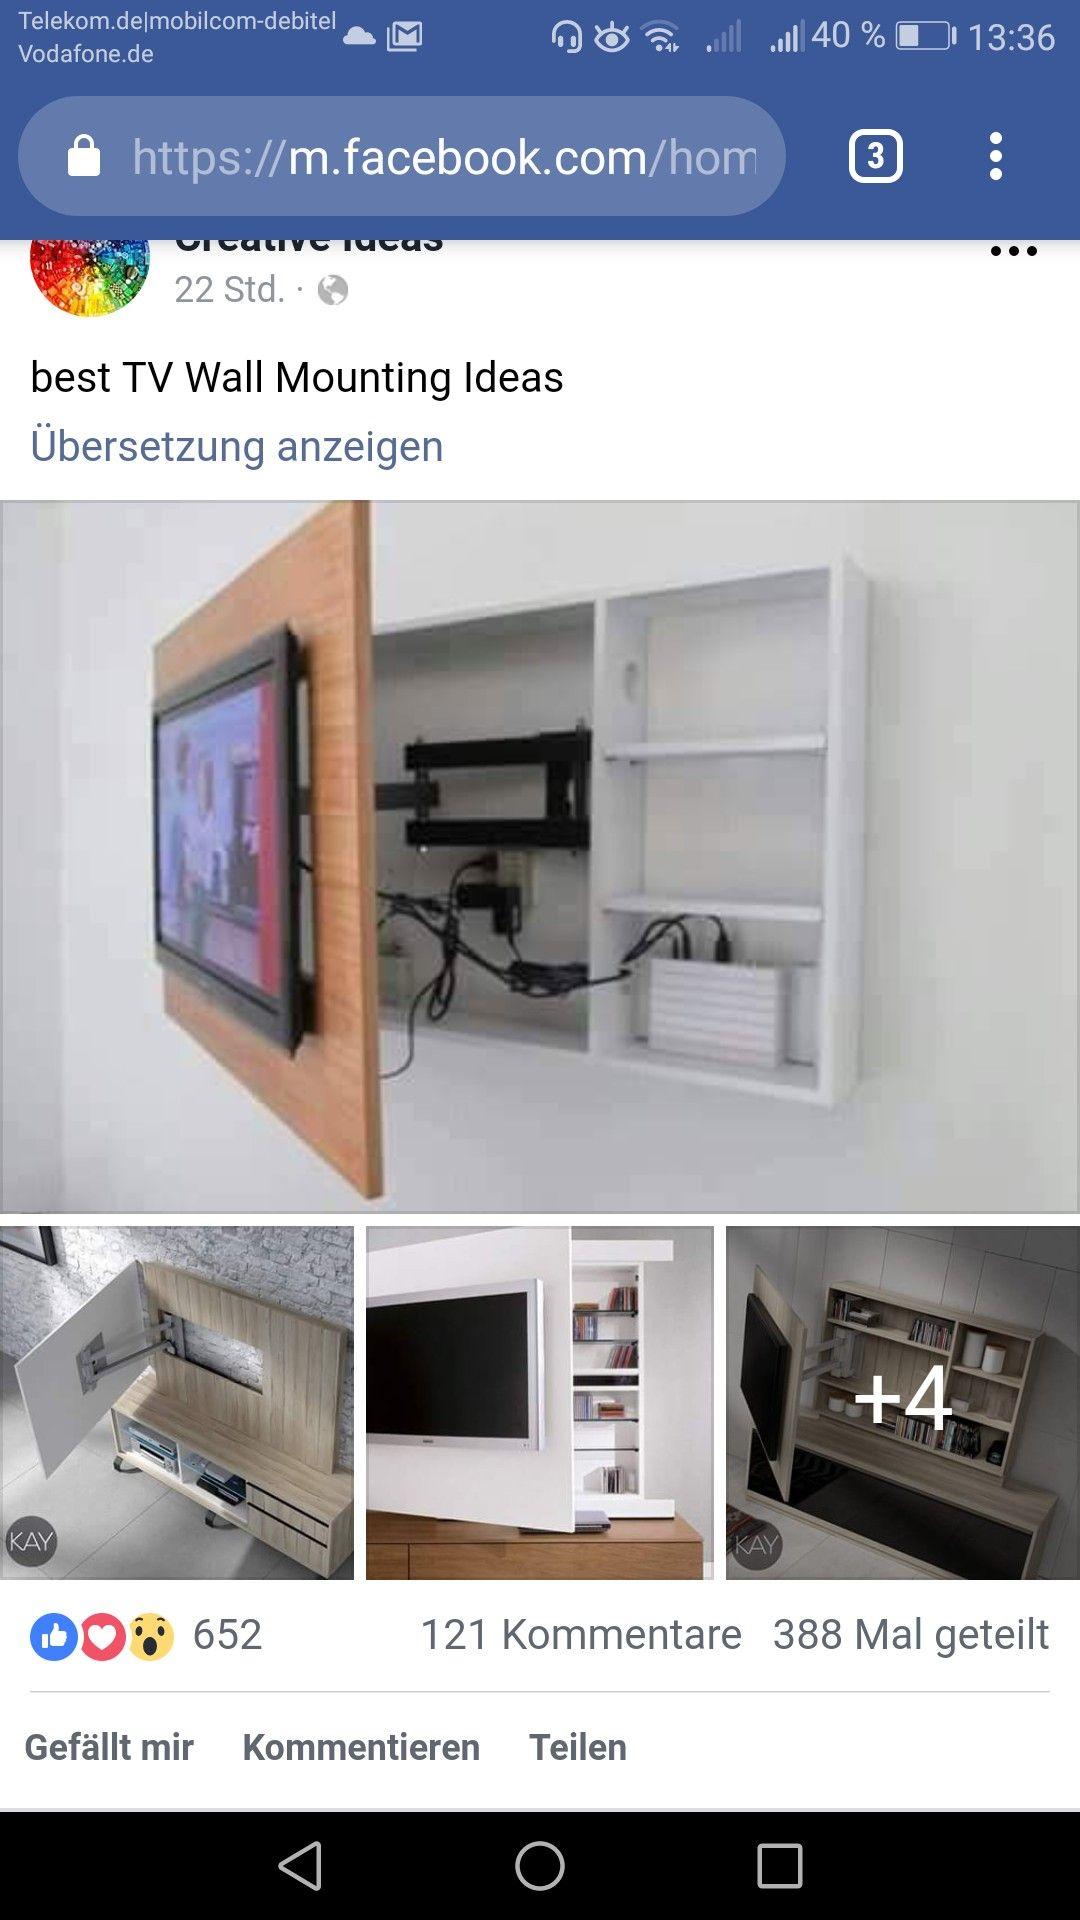 tv wand kabel verstecken home in 2019 tv wand kabel verstecken tv wand kabel und tv wand. Black Bedroom Furniture Sets. Home Design Ideas